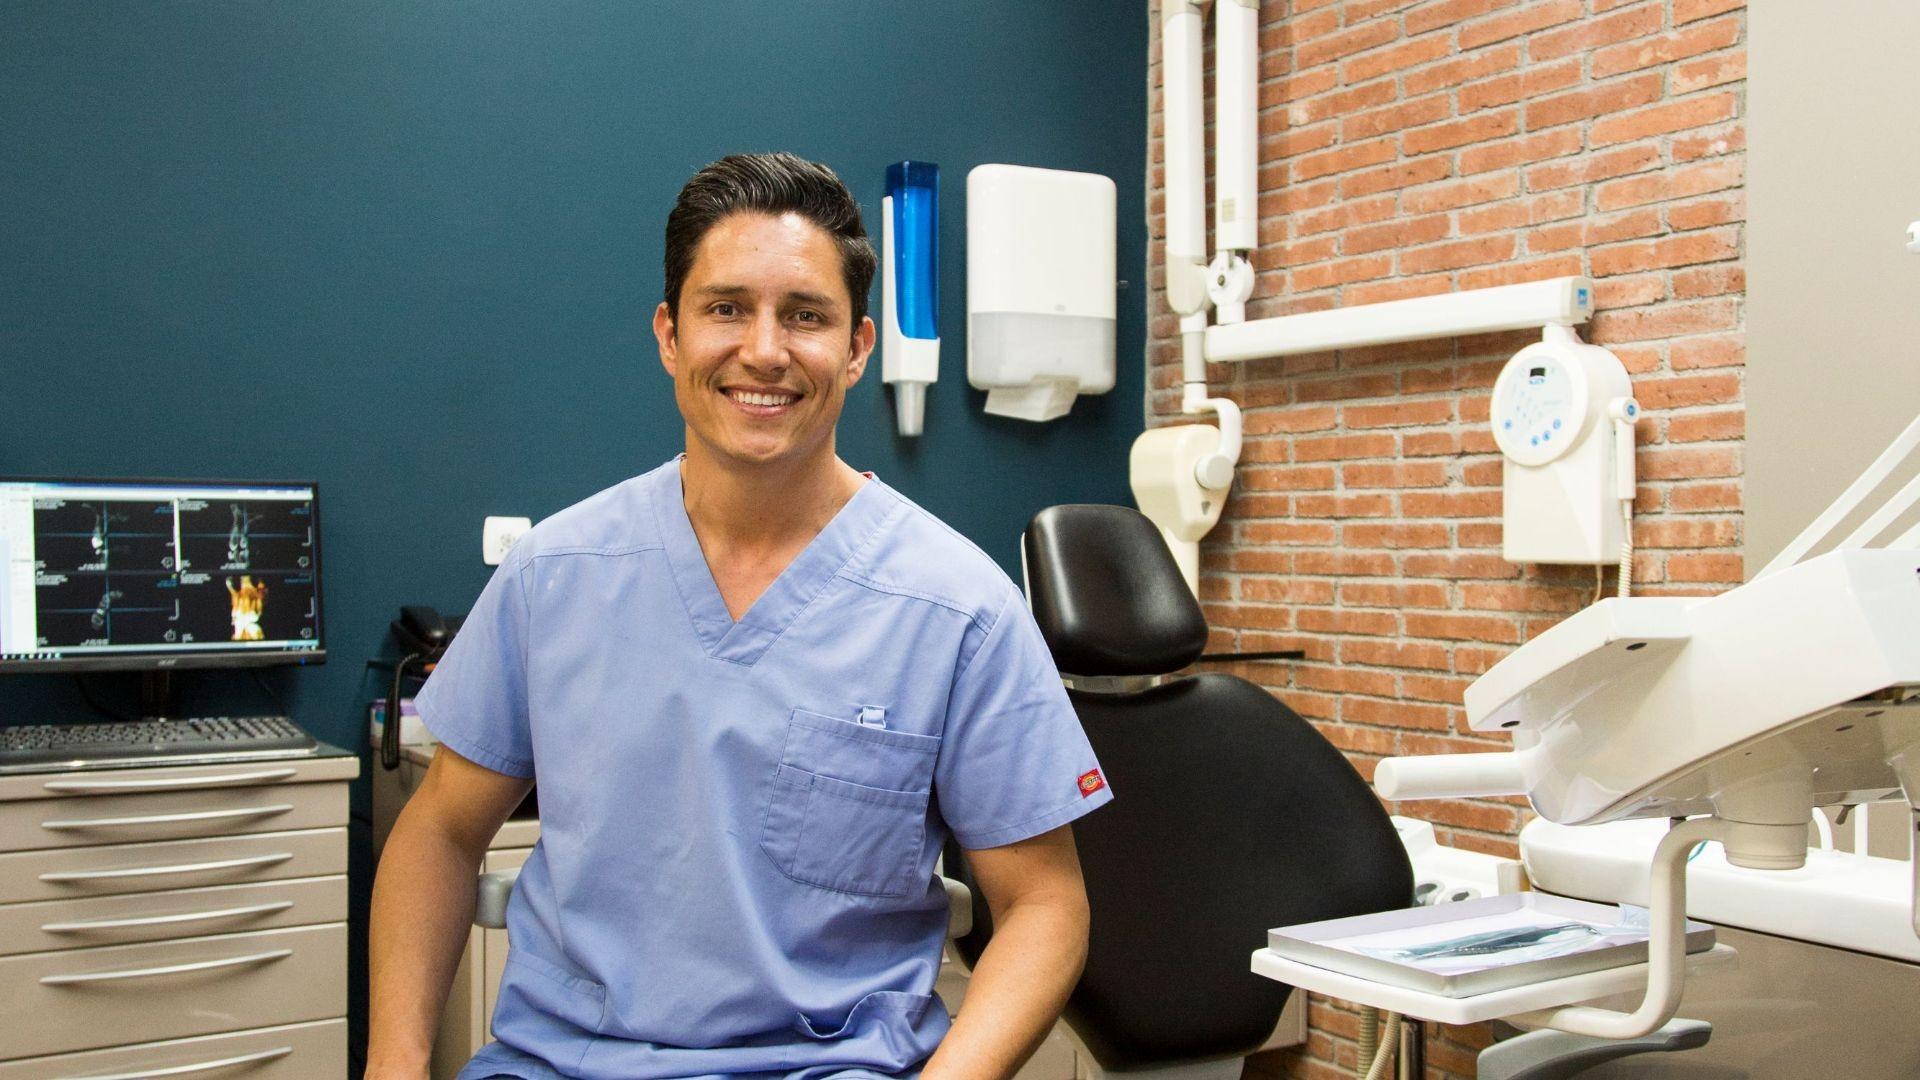 Implante dentales baratos en Hospitalet de Llobregat